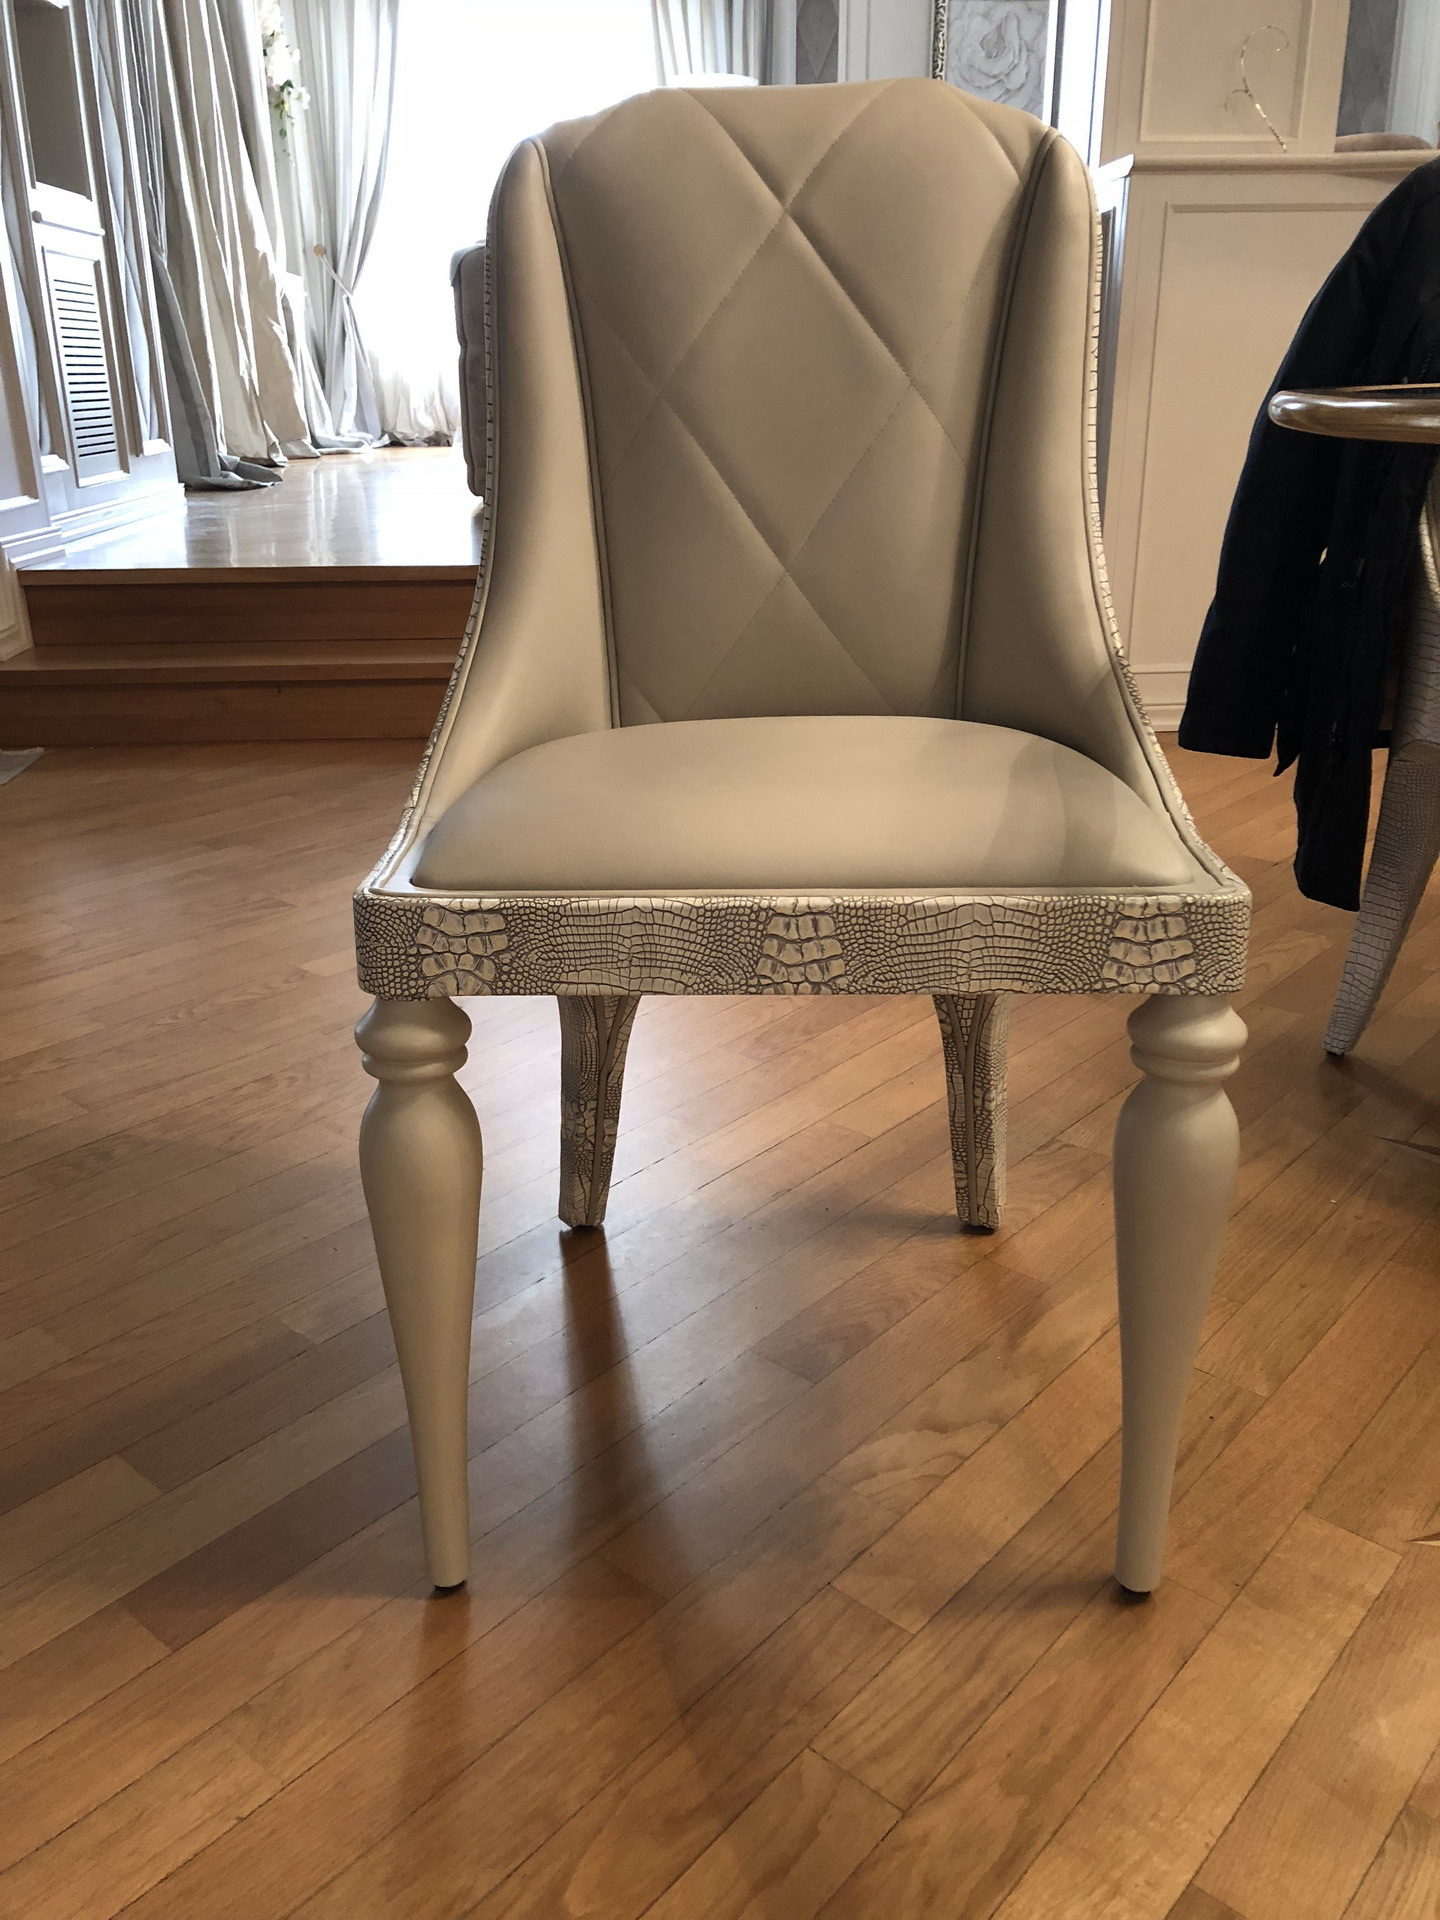 sedia-imbottita-pelle-moderna-3